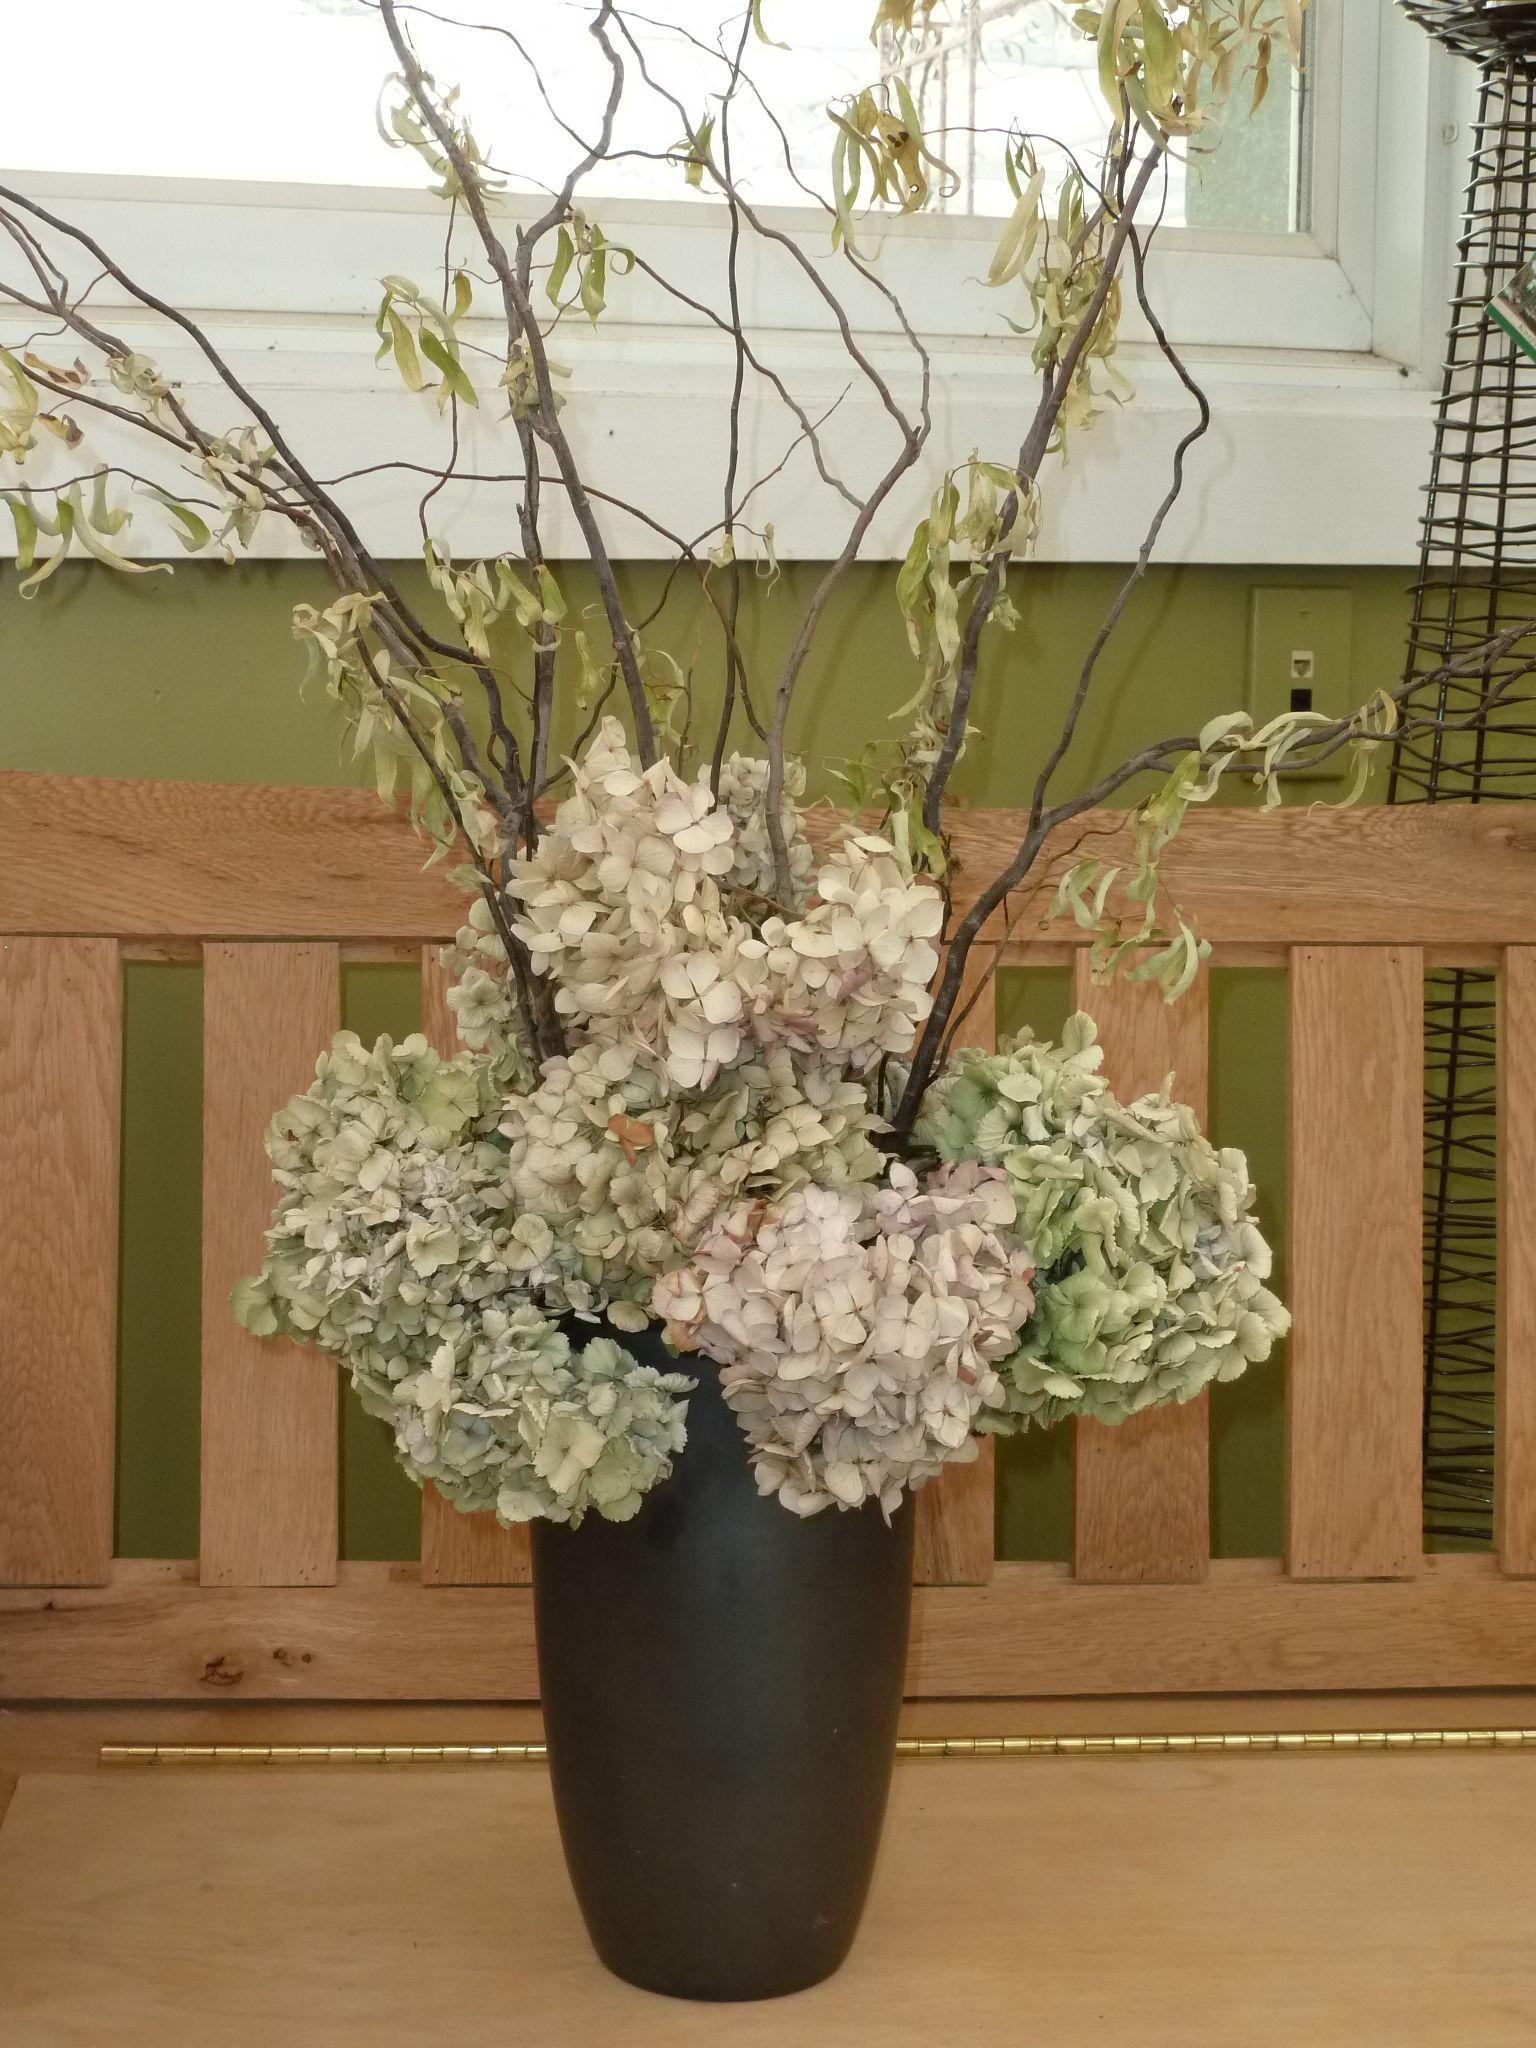 The Art Of Dried Flowers Hydrangea Arrangements Dried Hydrangeas Centerpiece Dried Flower Arrangements